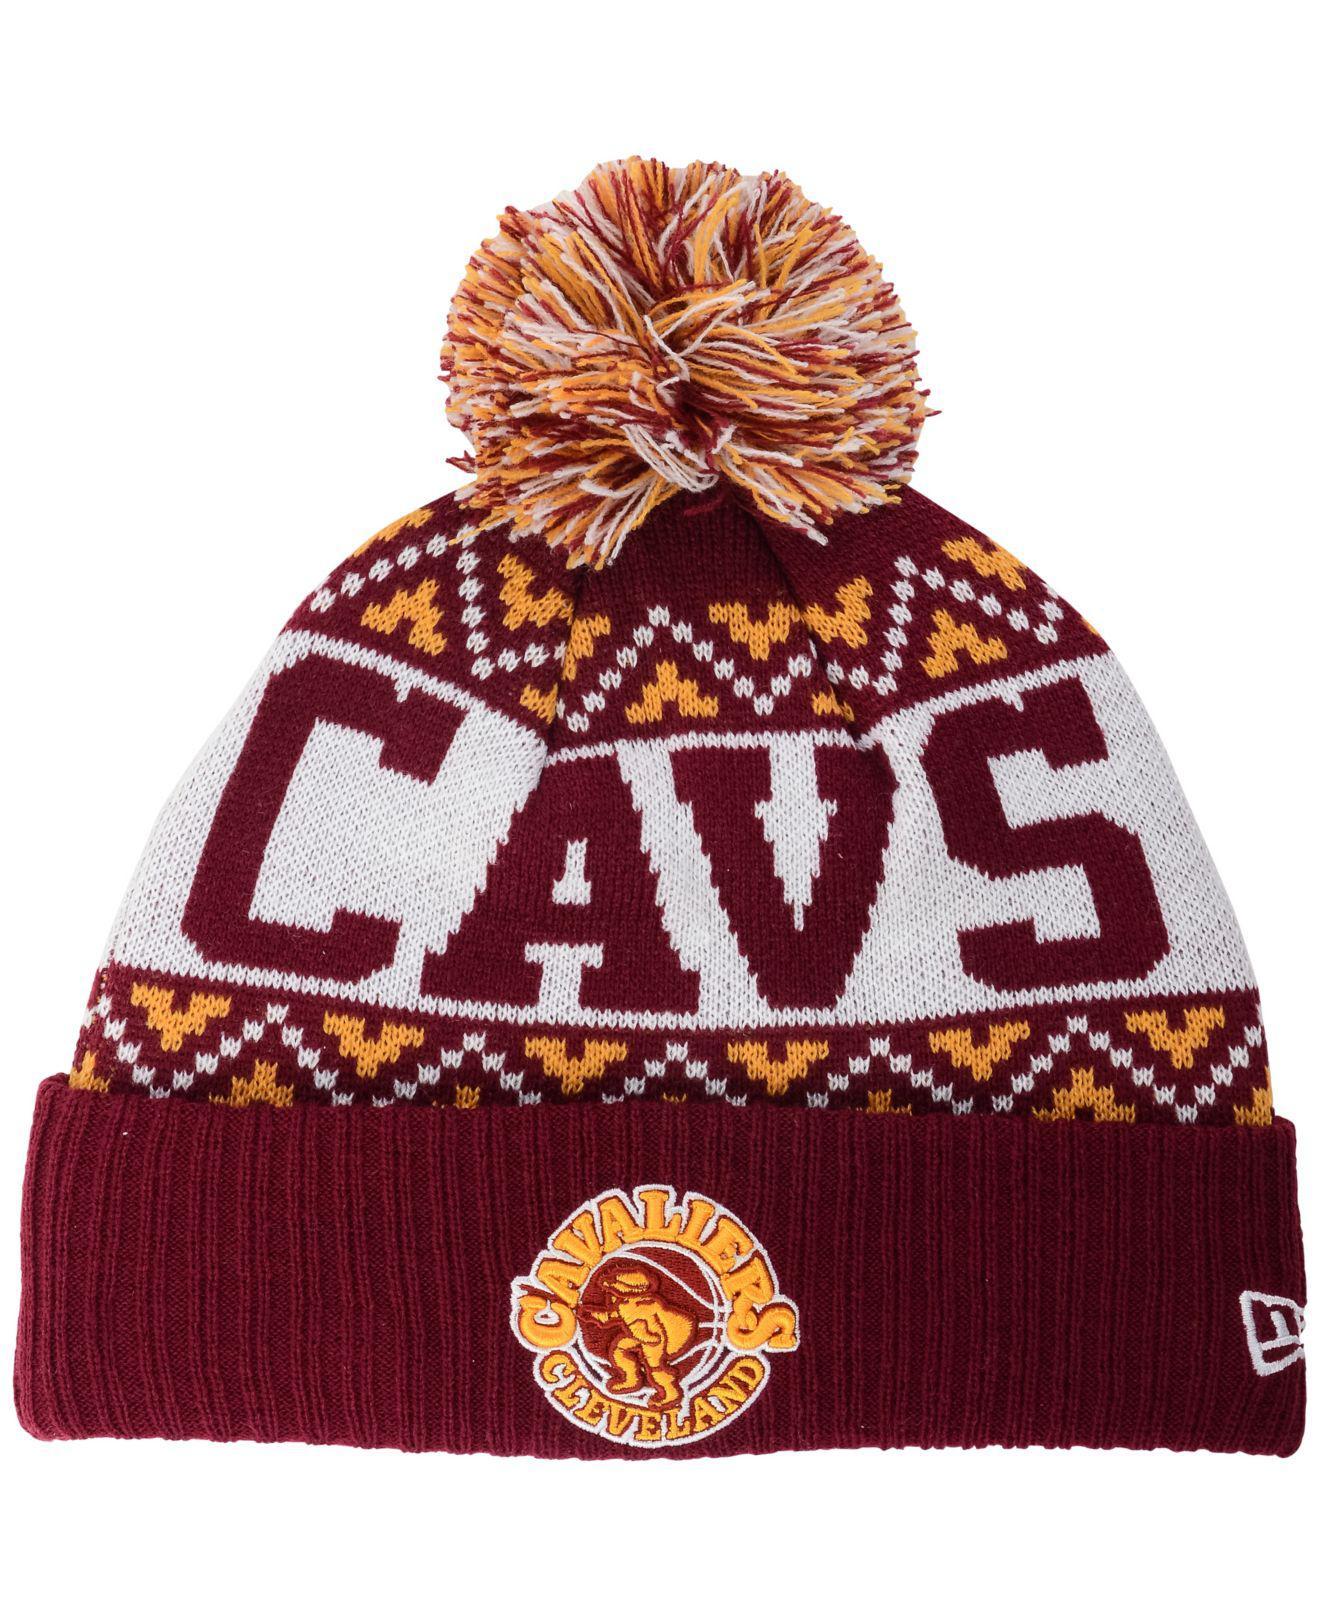 943f0eef421cdb KTZ - Purple Cleveland Cavaliers Biggest Christmas Knit Hat for Men - Lyst